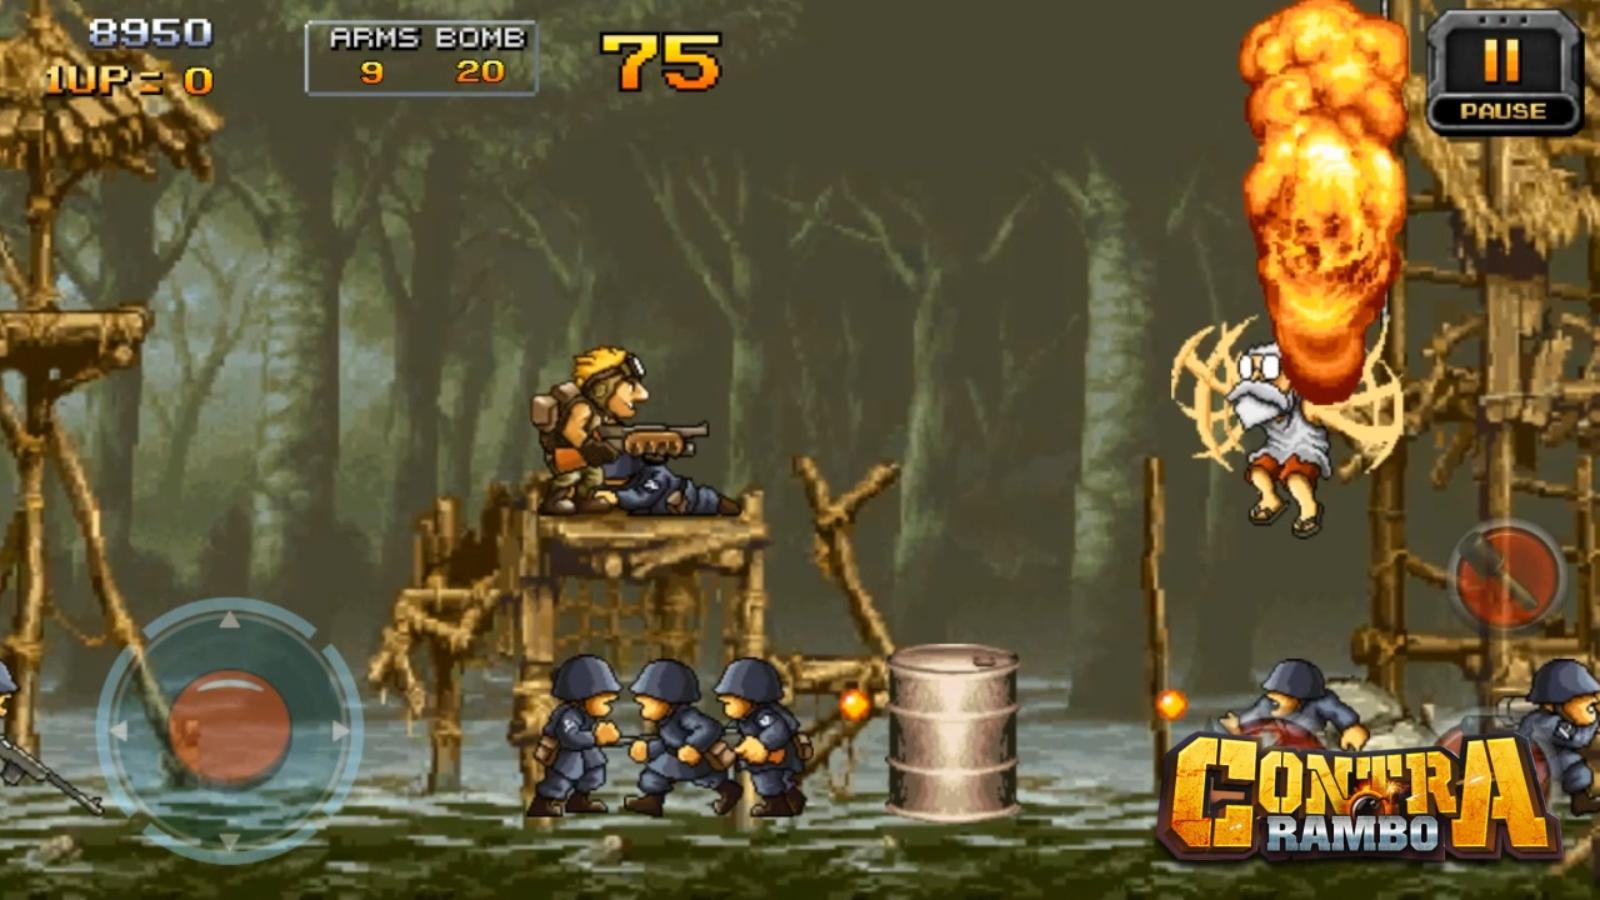 contra-rambo-2 Contra Rambo: uma cópia de Metal Slug que vale a pena jogar